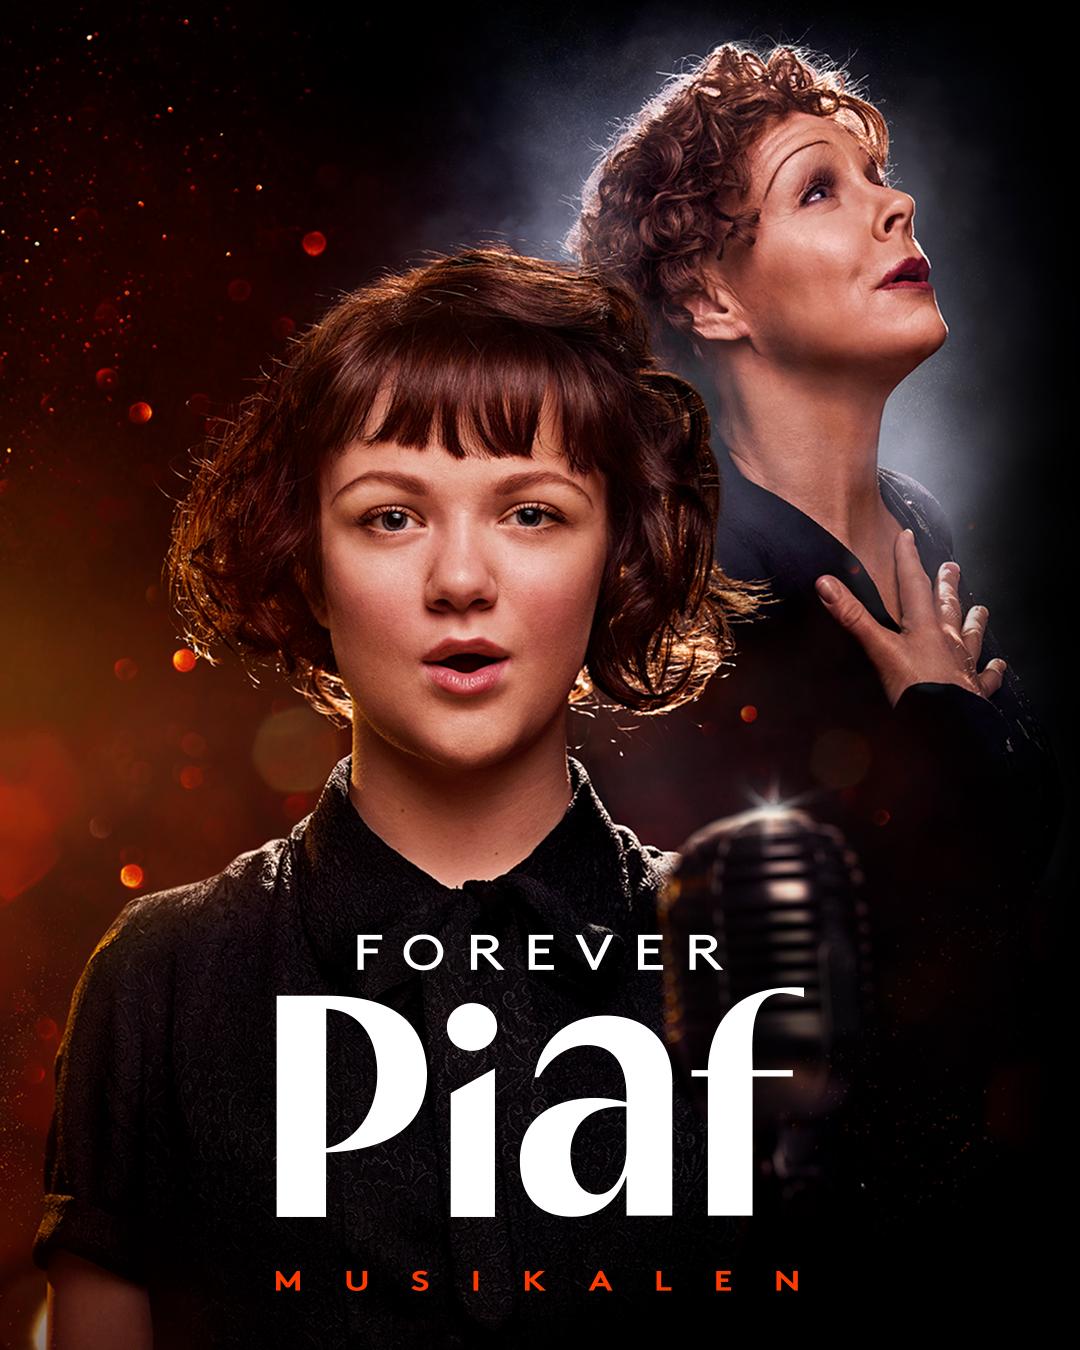 Forever Piaf Gota Lejon Hotellpaket Med Biljetter Nojesresor Se